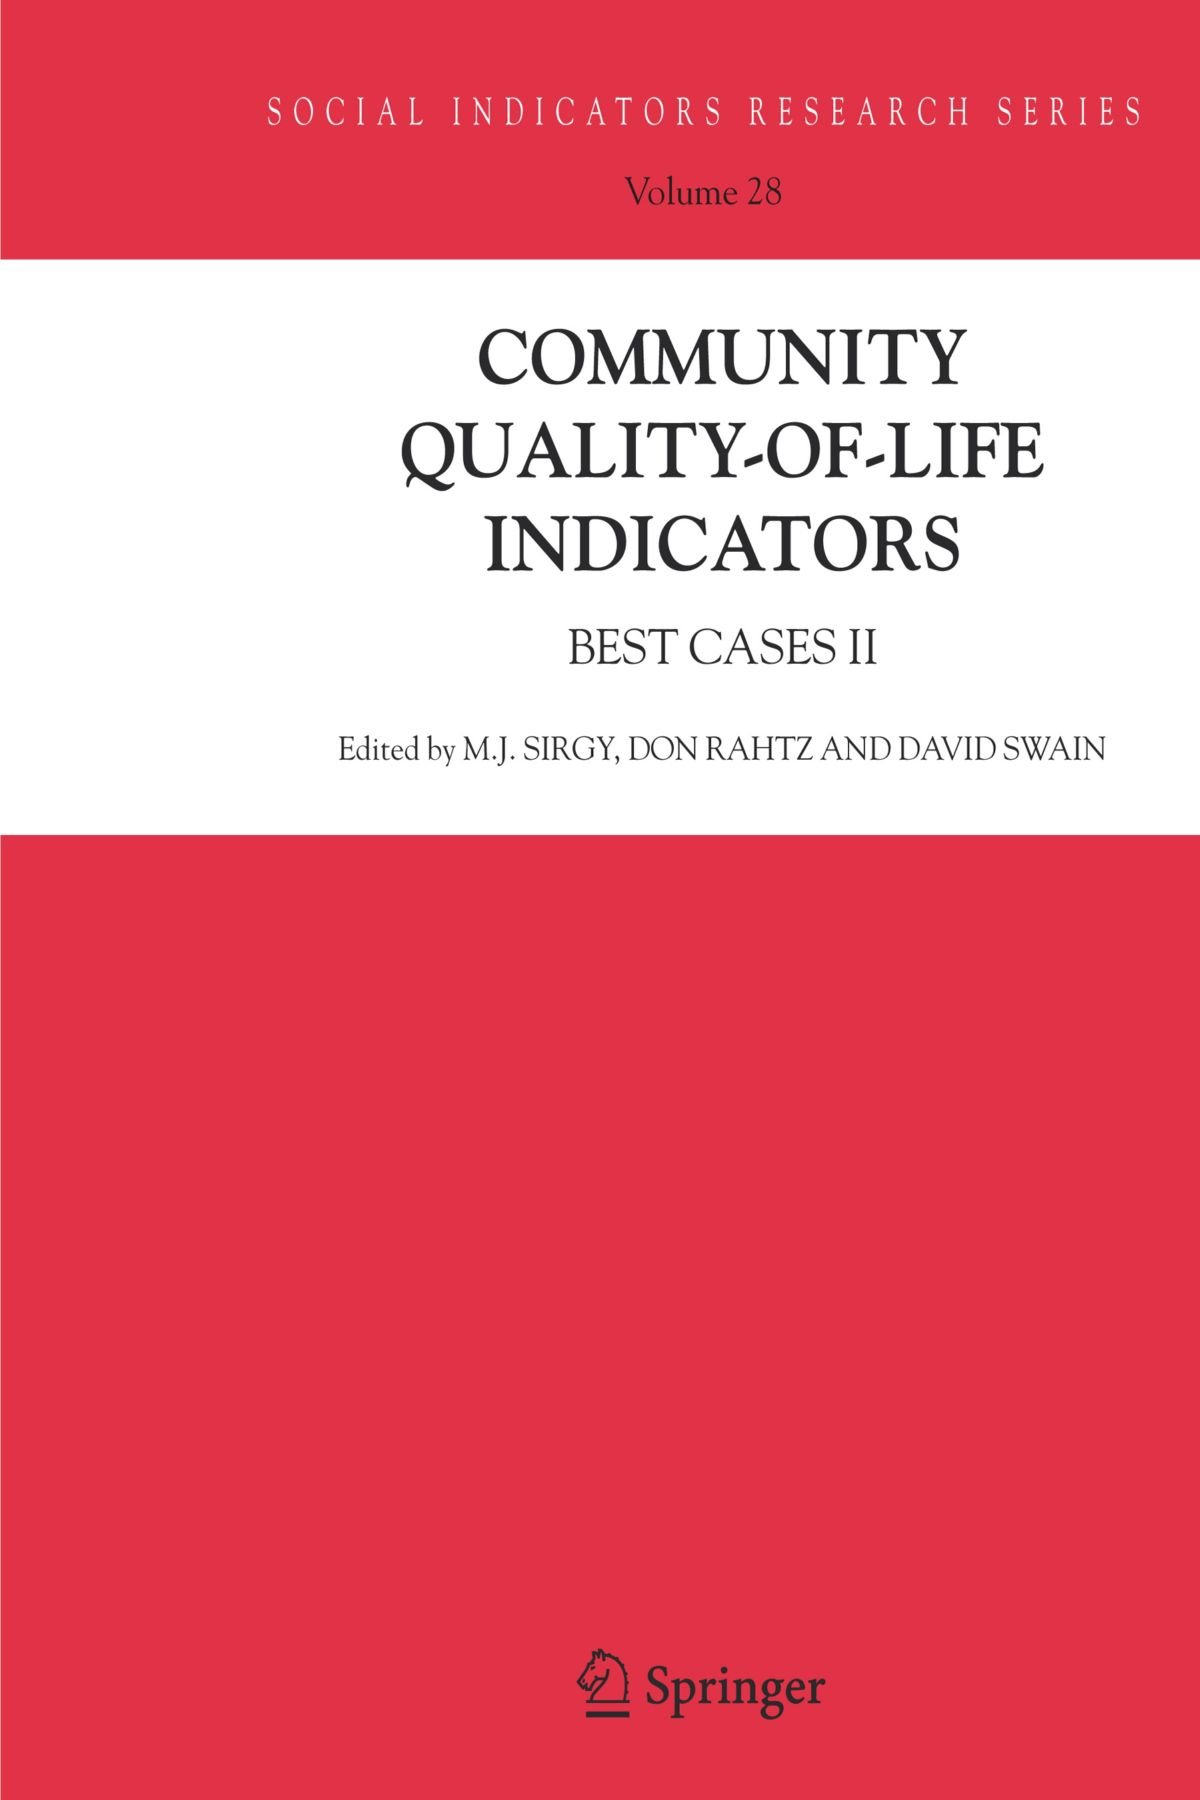 Community Quality-of-Life Indicators: Best Cases II (Social Indicators Research Series)